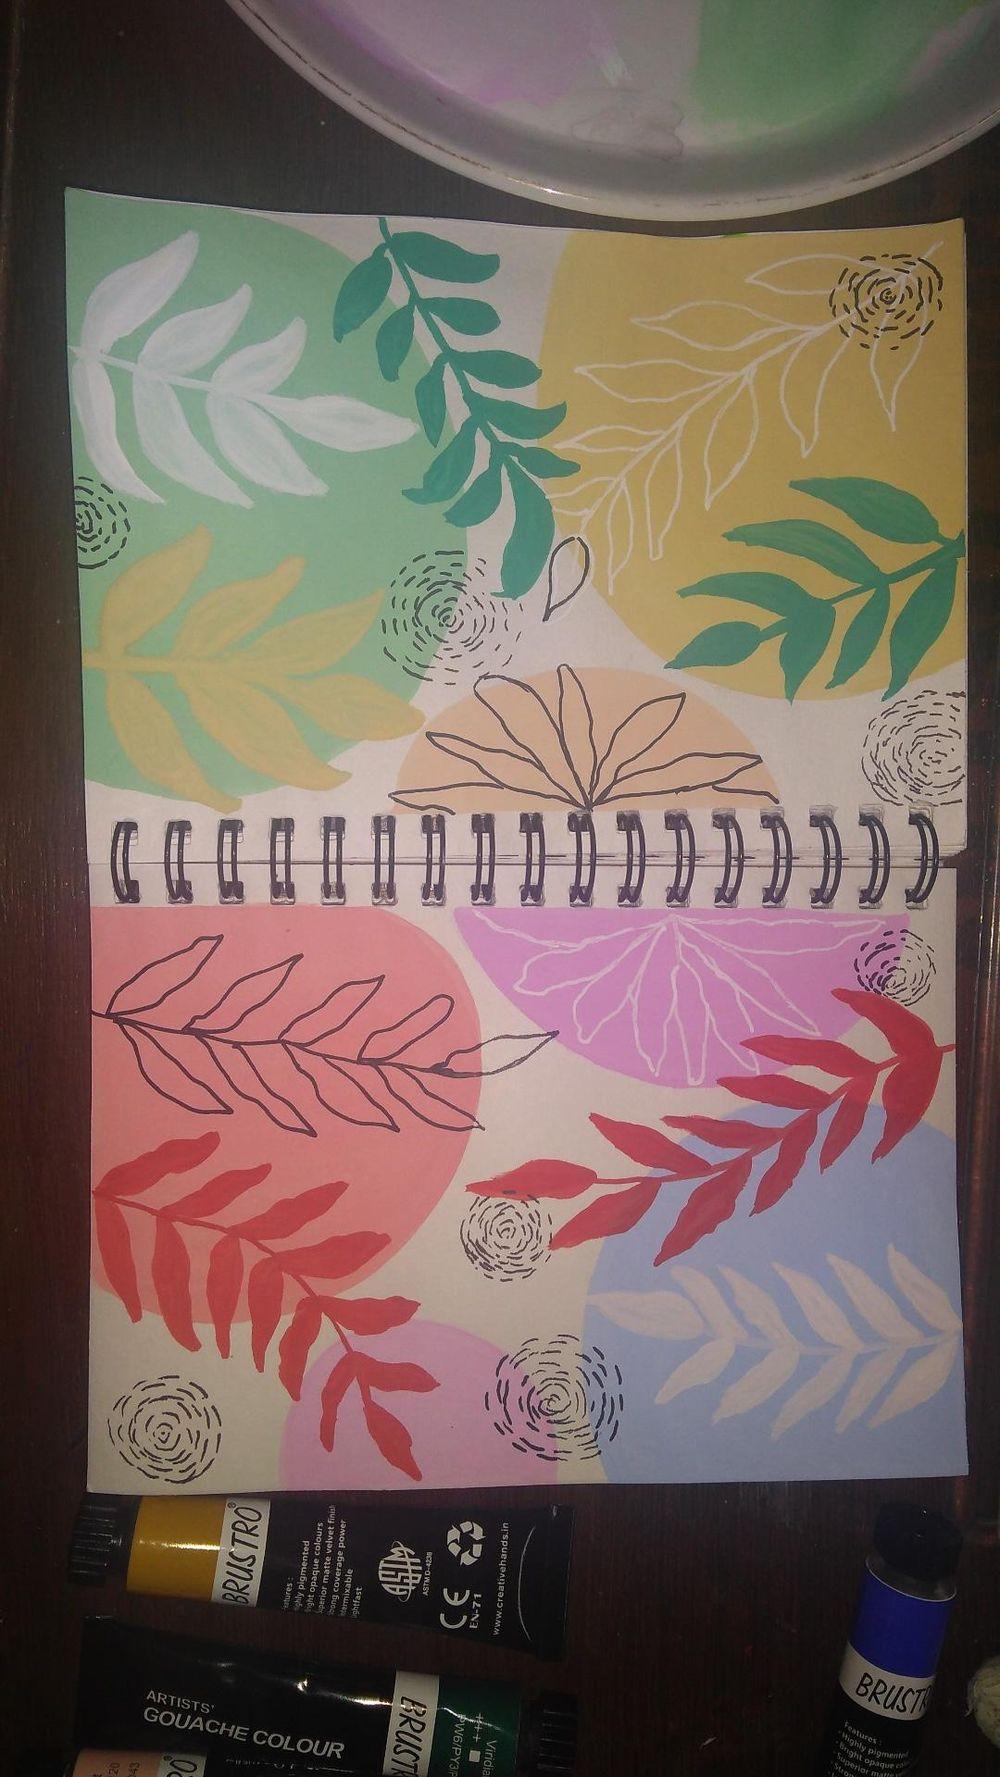 gouache patterns - image 2 - student project